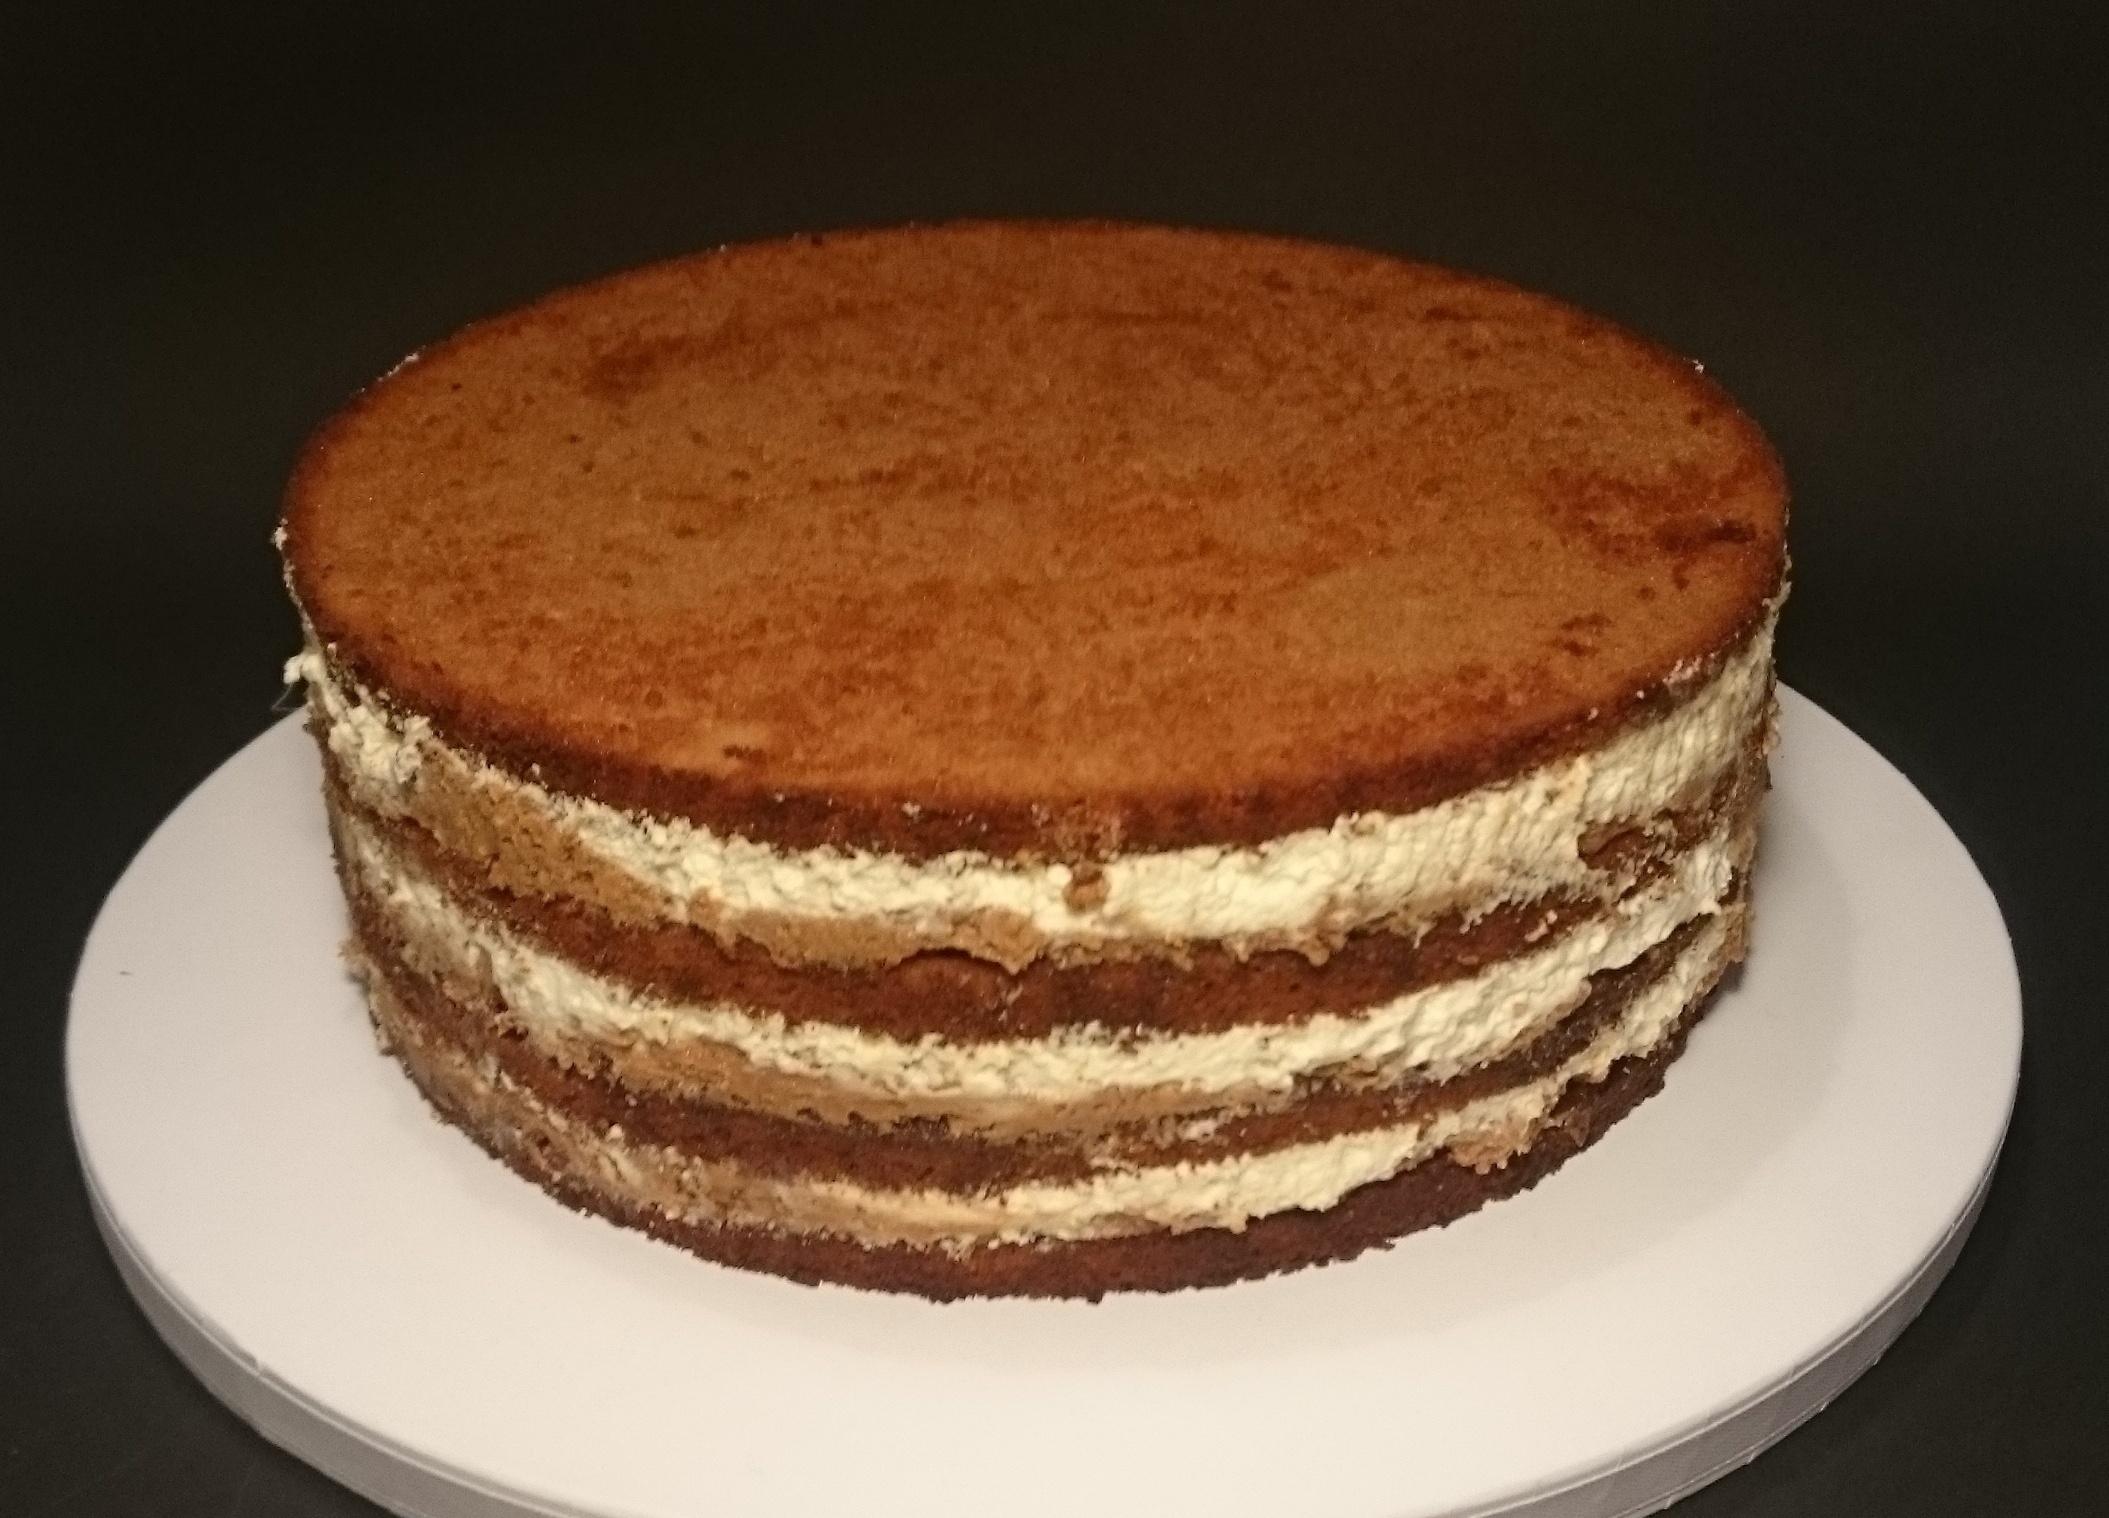 Lieblings Schokoladen-Keks-Torte a la Cake Pirate